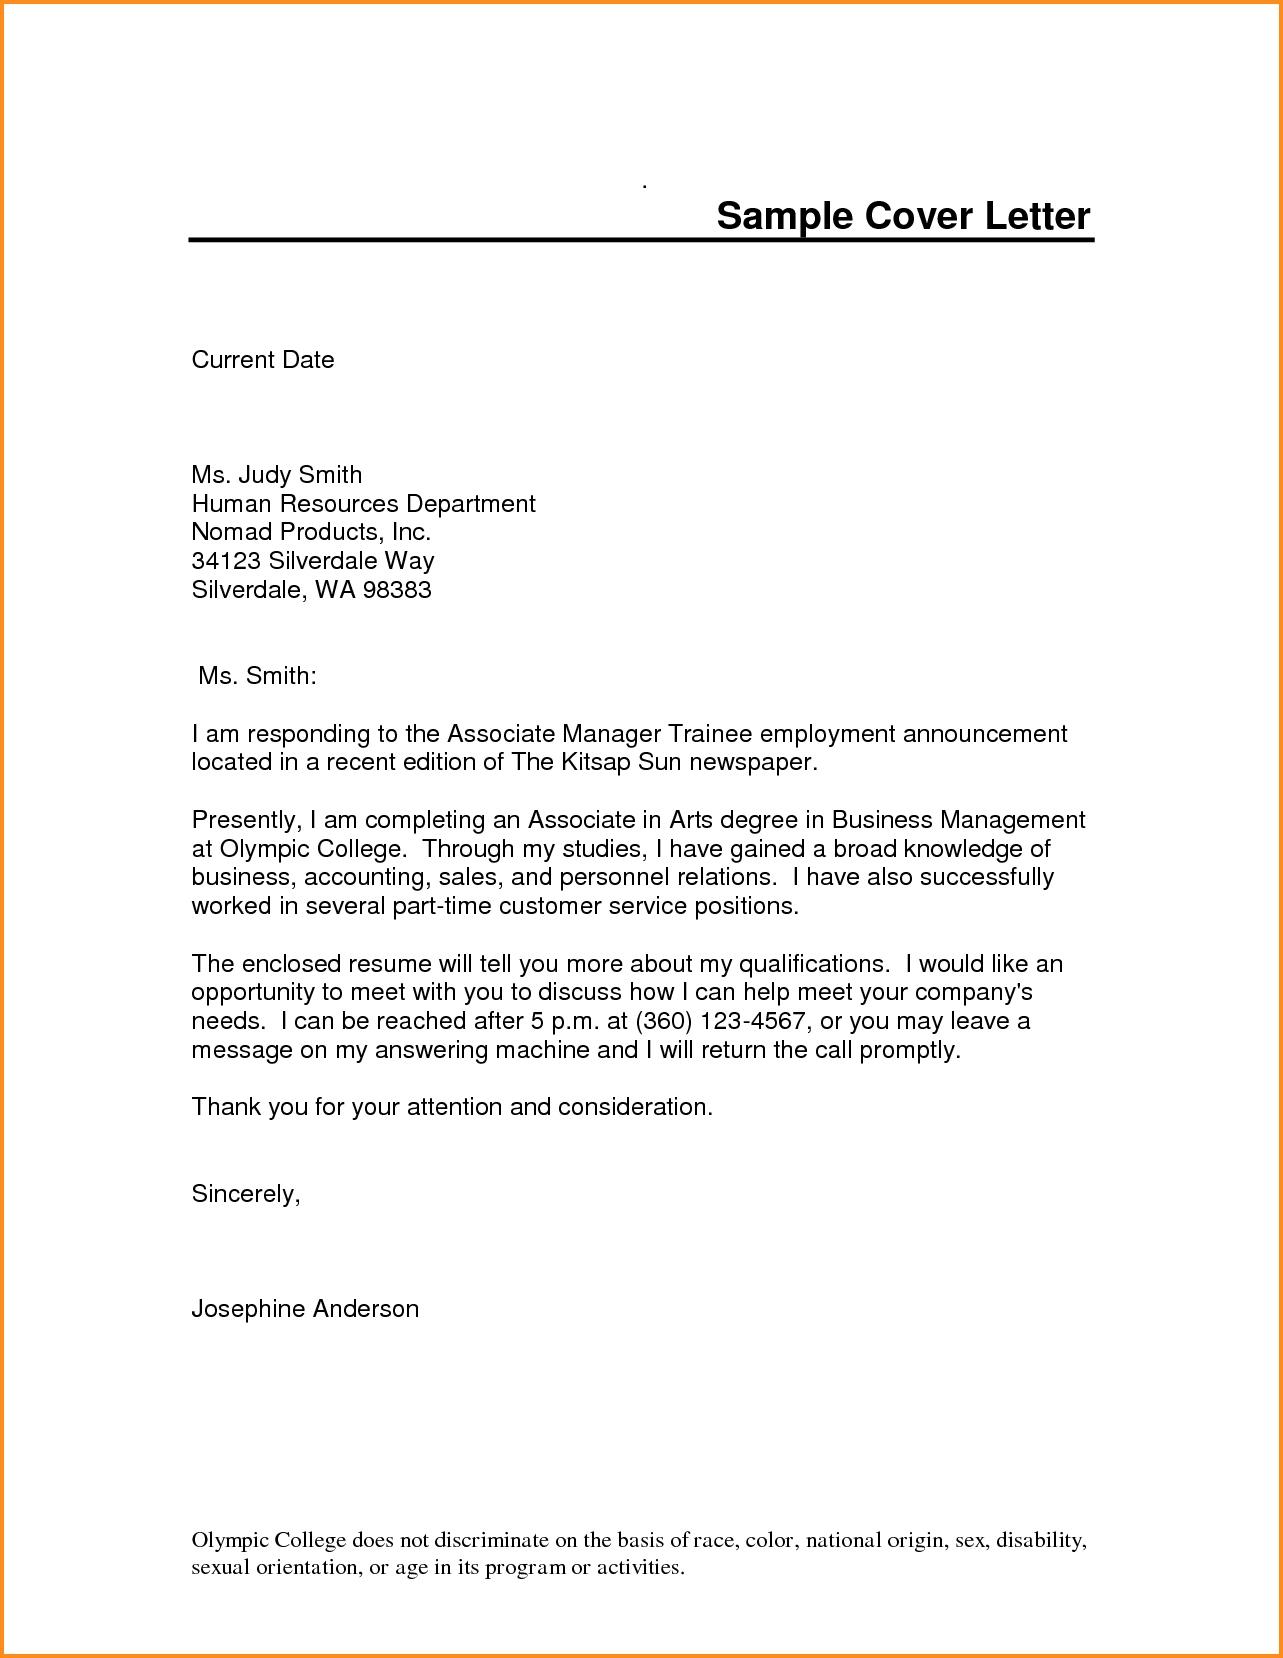 021 Template Ideas Letter Of Interest Microsoft Word Free With Regard To Letter Of Interest Template Microsoft Word